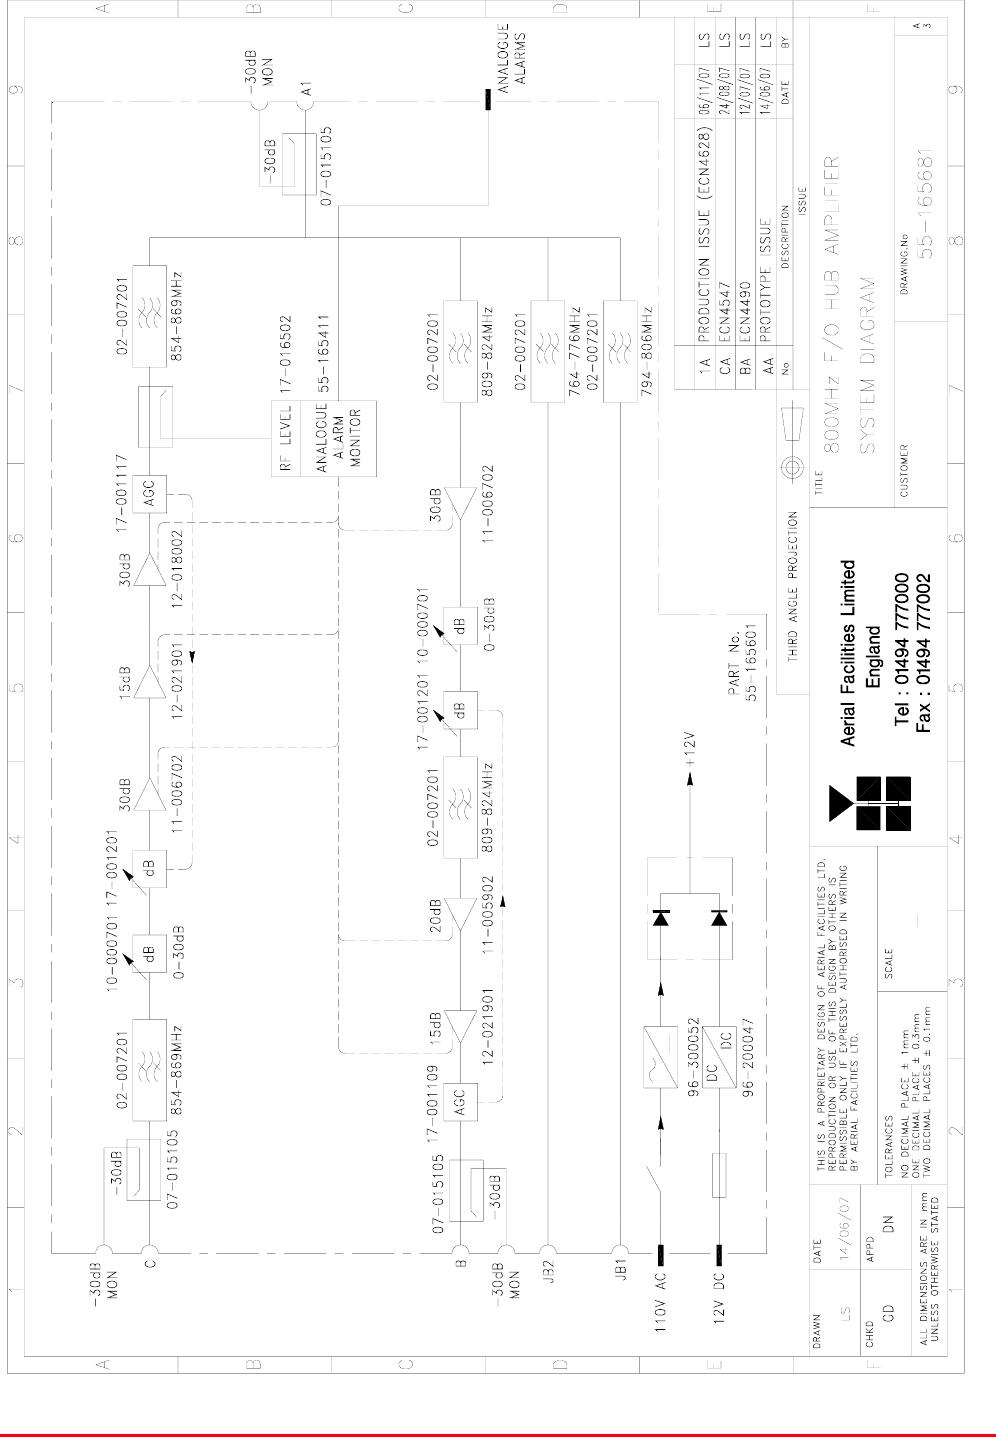 Axell Wireless 55-165703 55-165703 Cell Enhancer User Manual